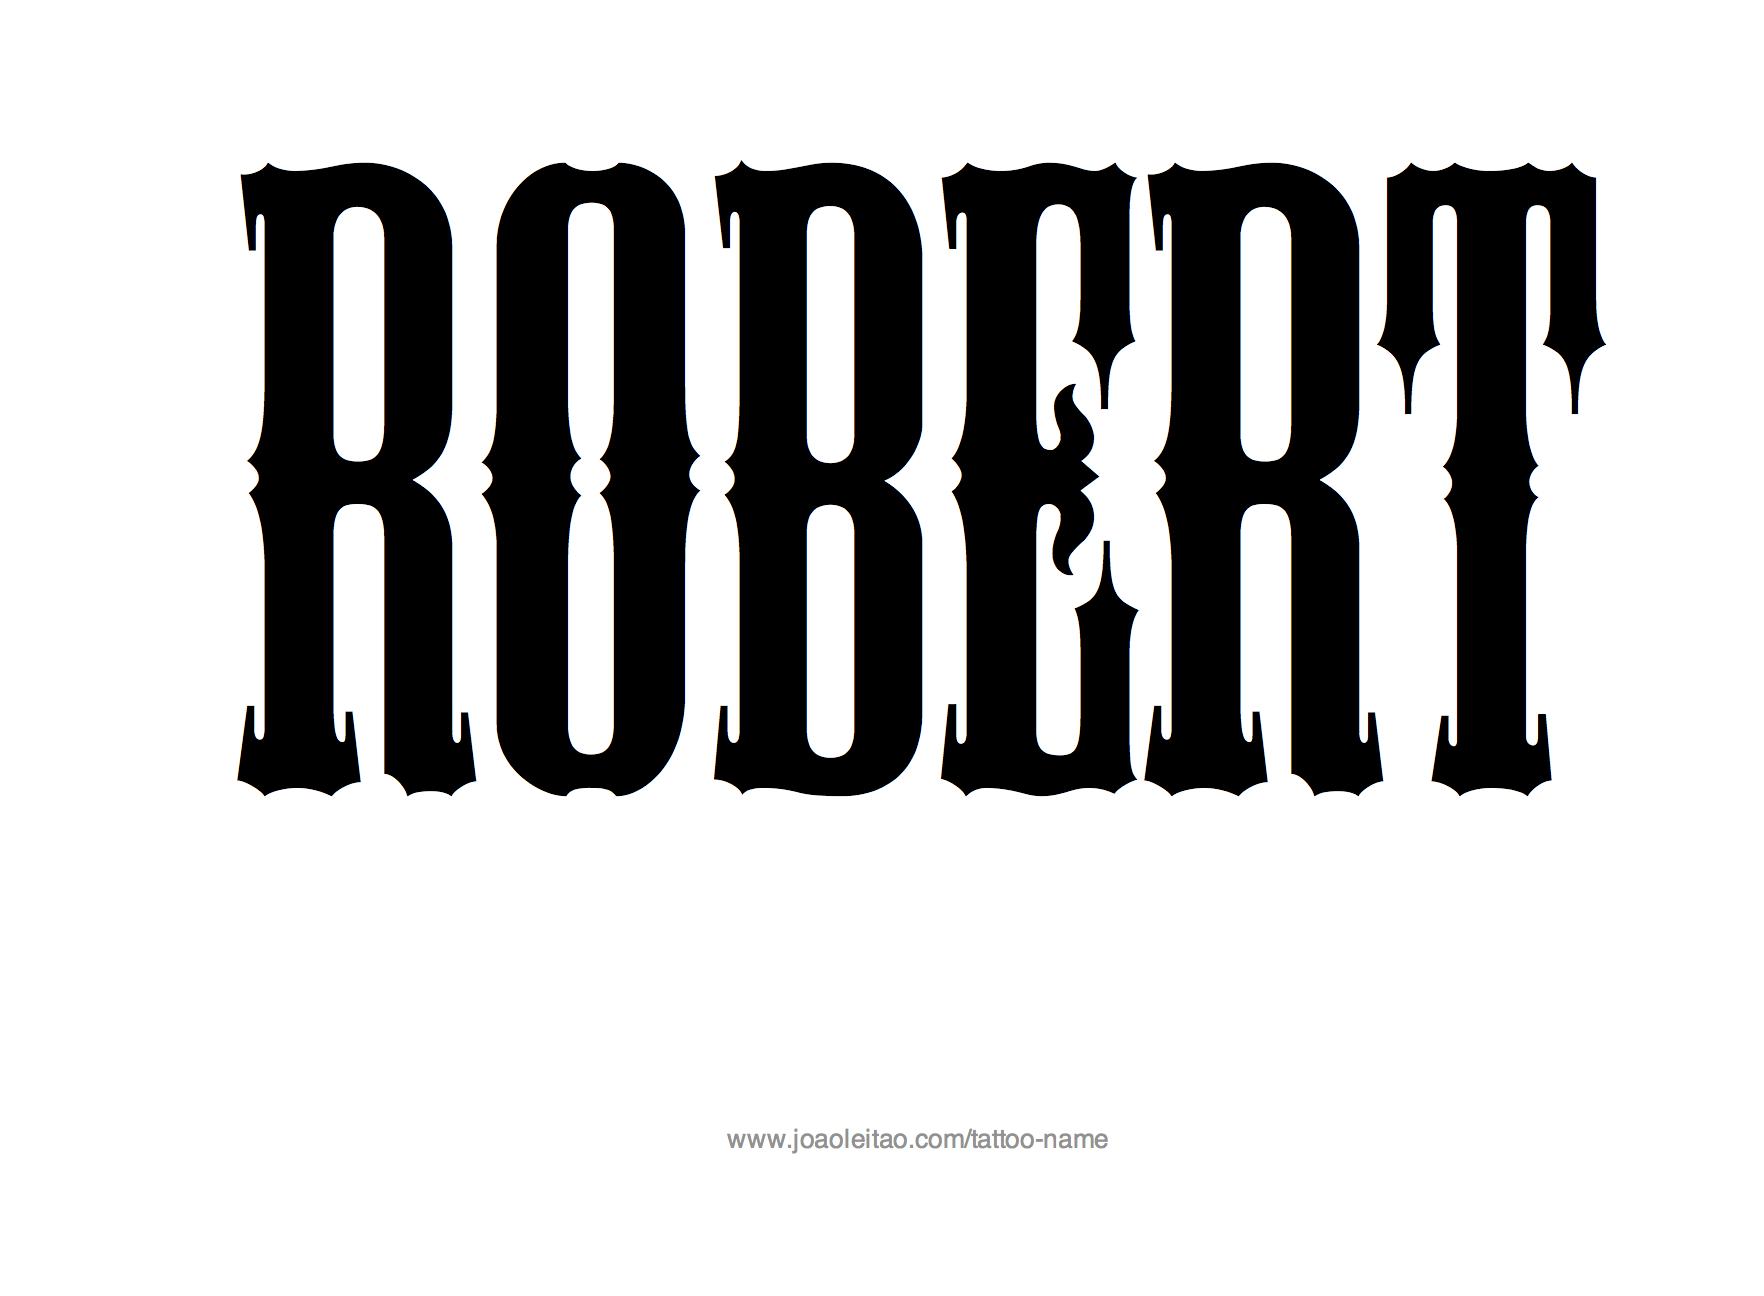 Robert Name Tattoo Designs